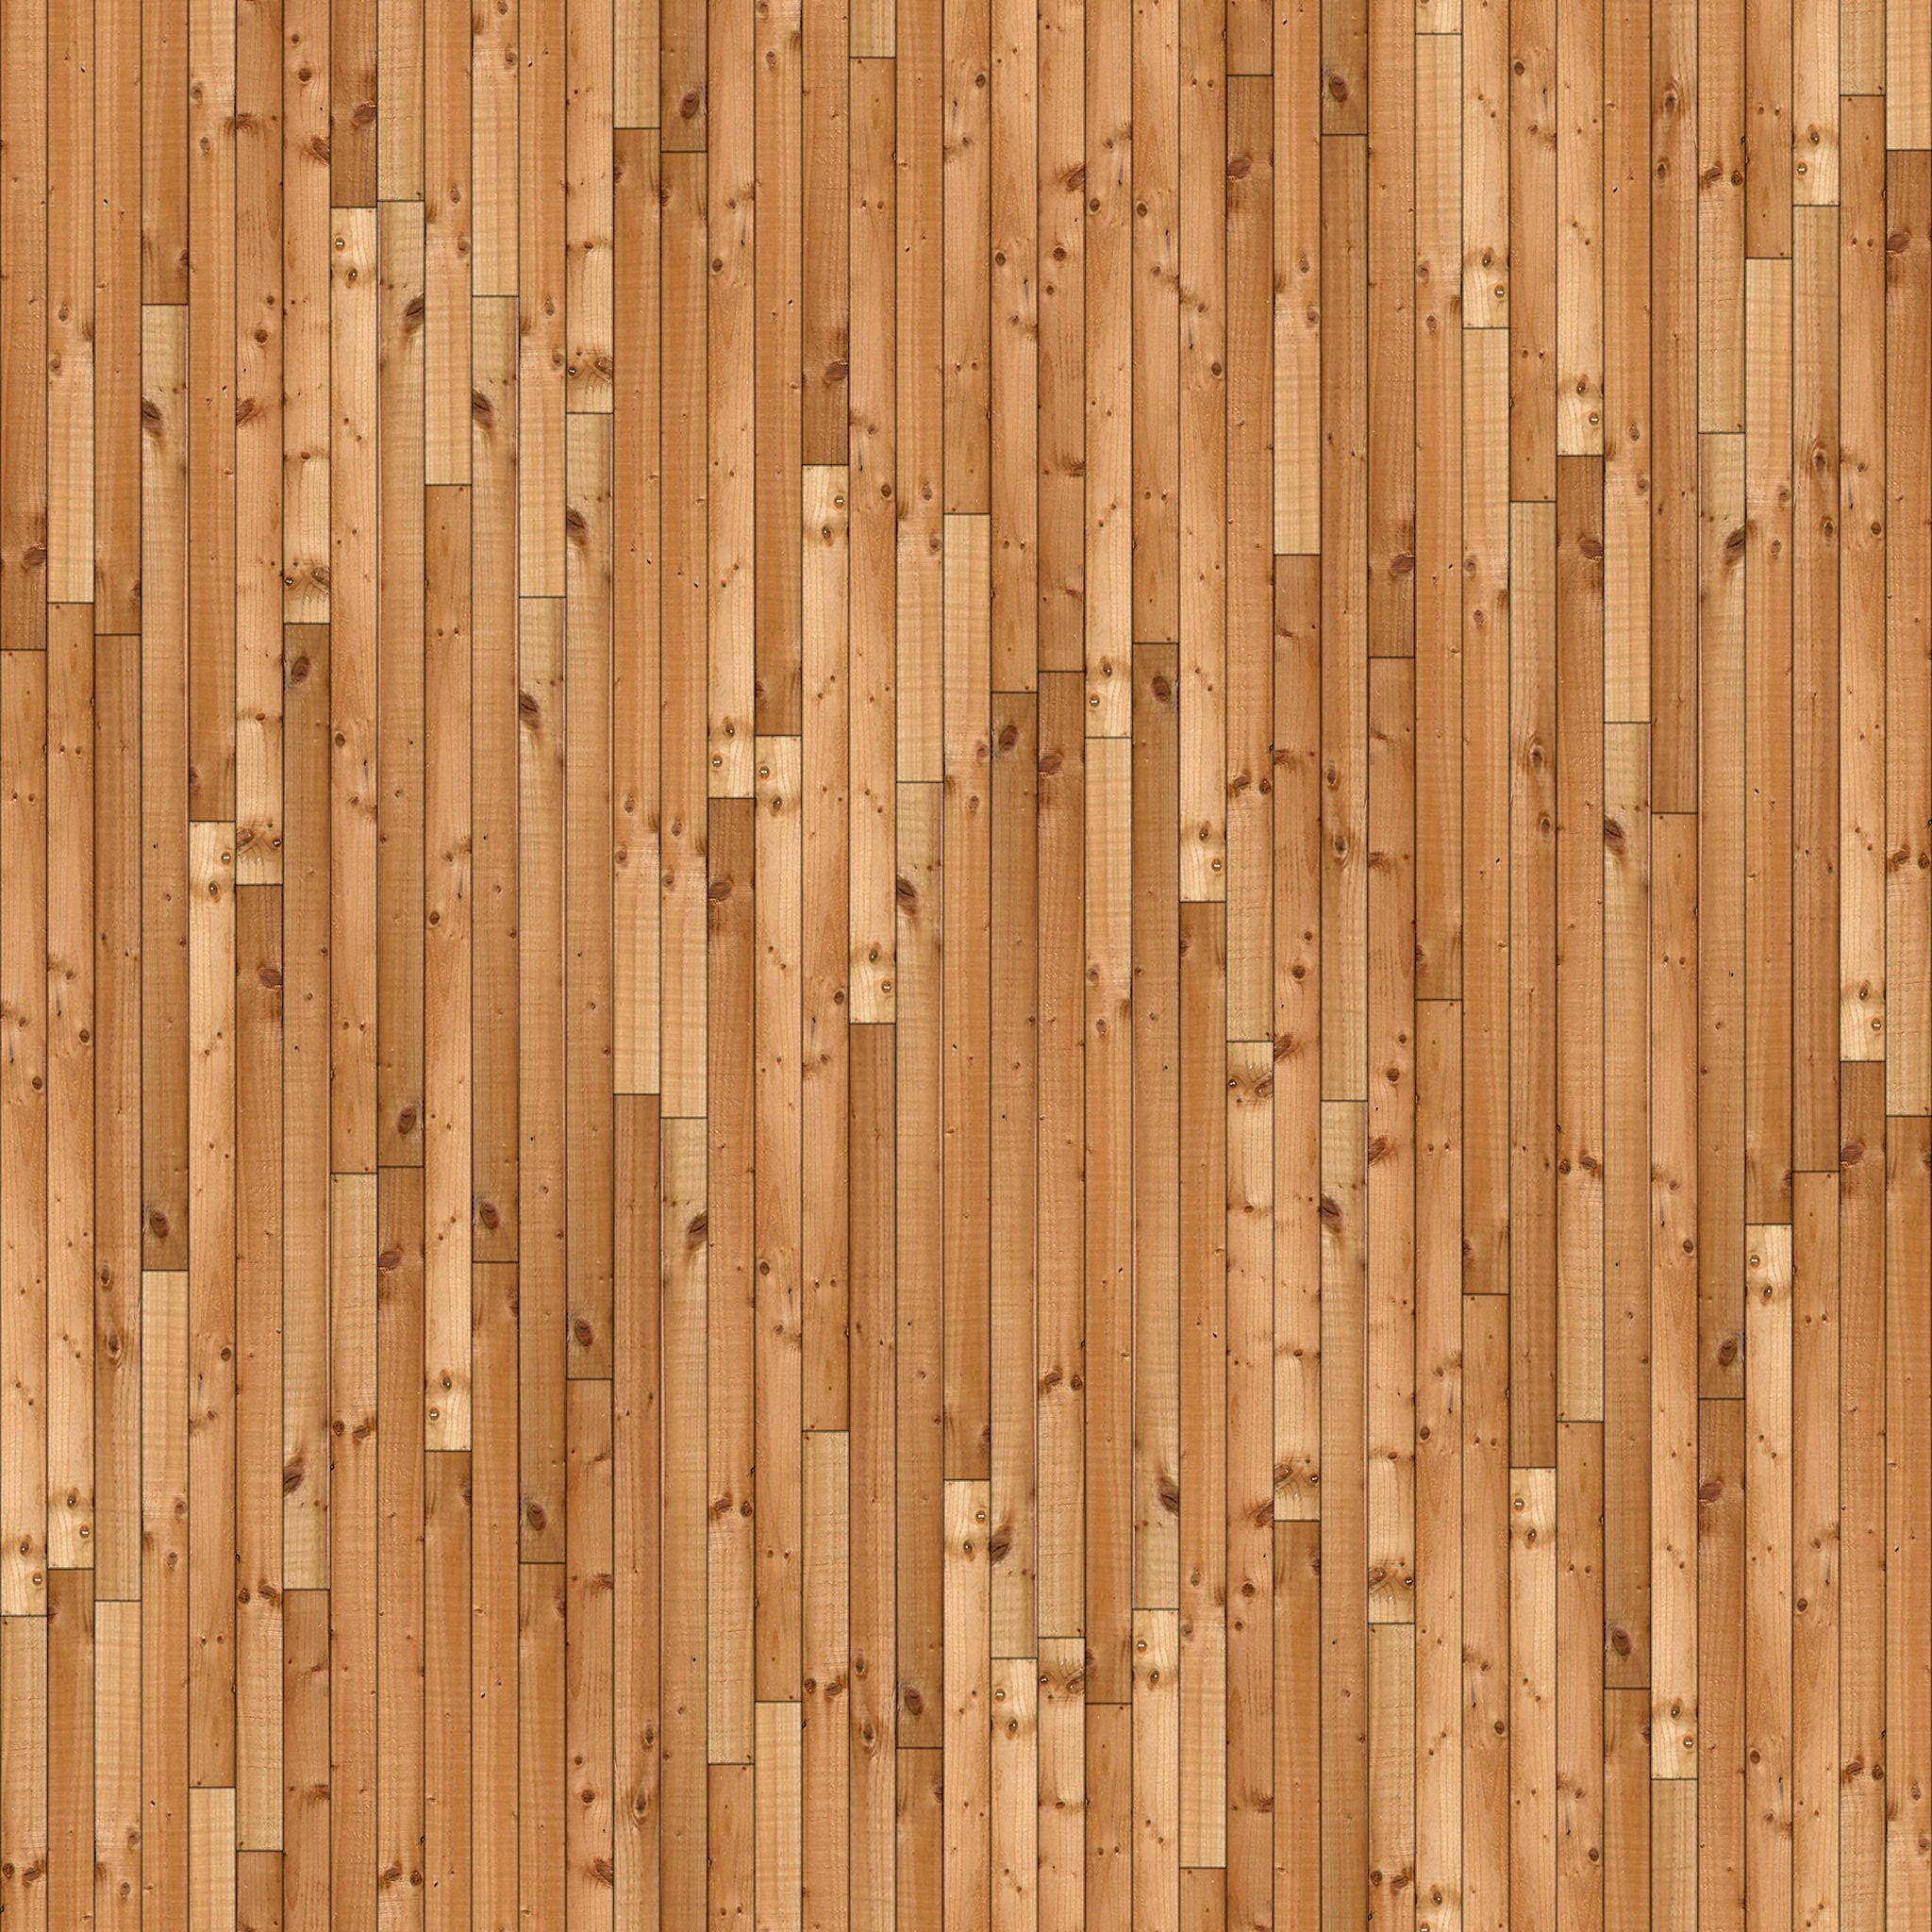 … Inspiring Ideas Wood Floors Background 10 Floor Wallpaper  Textures Backgrounds Hardwood O 757523907 Design …